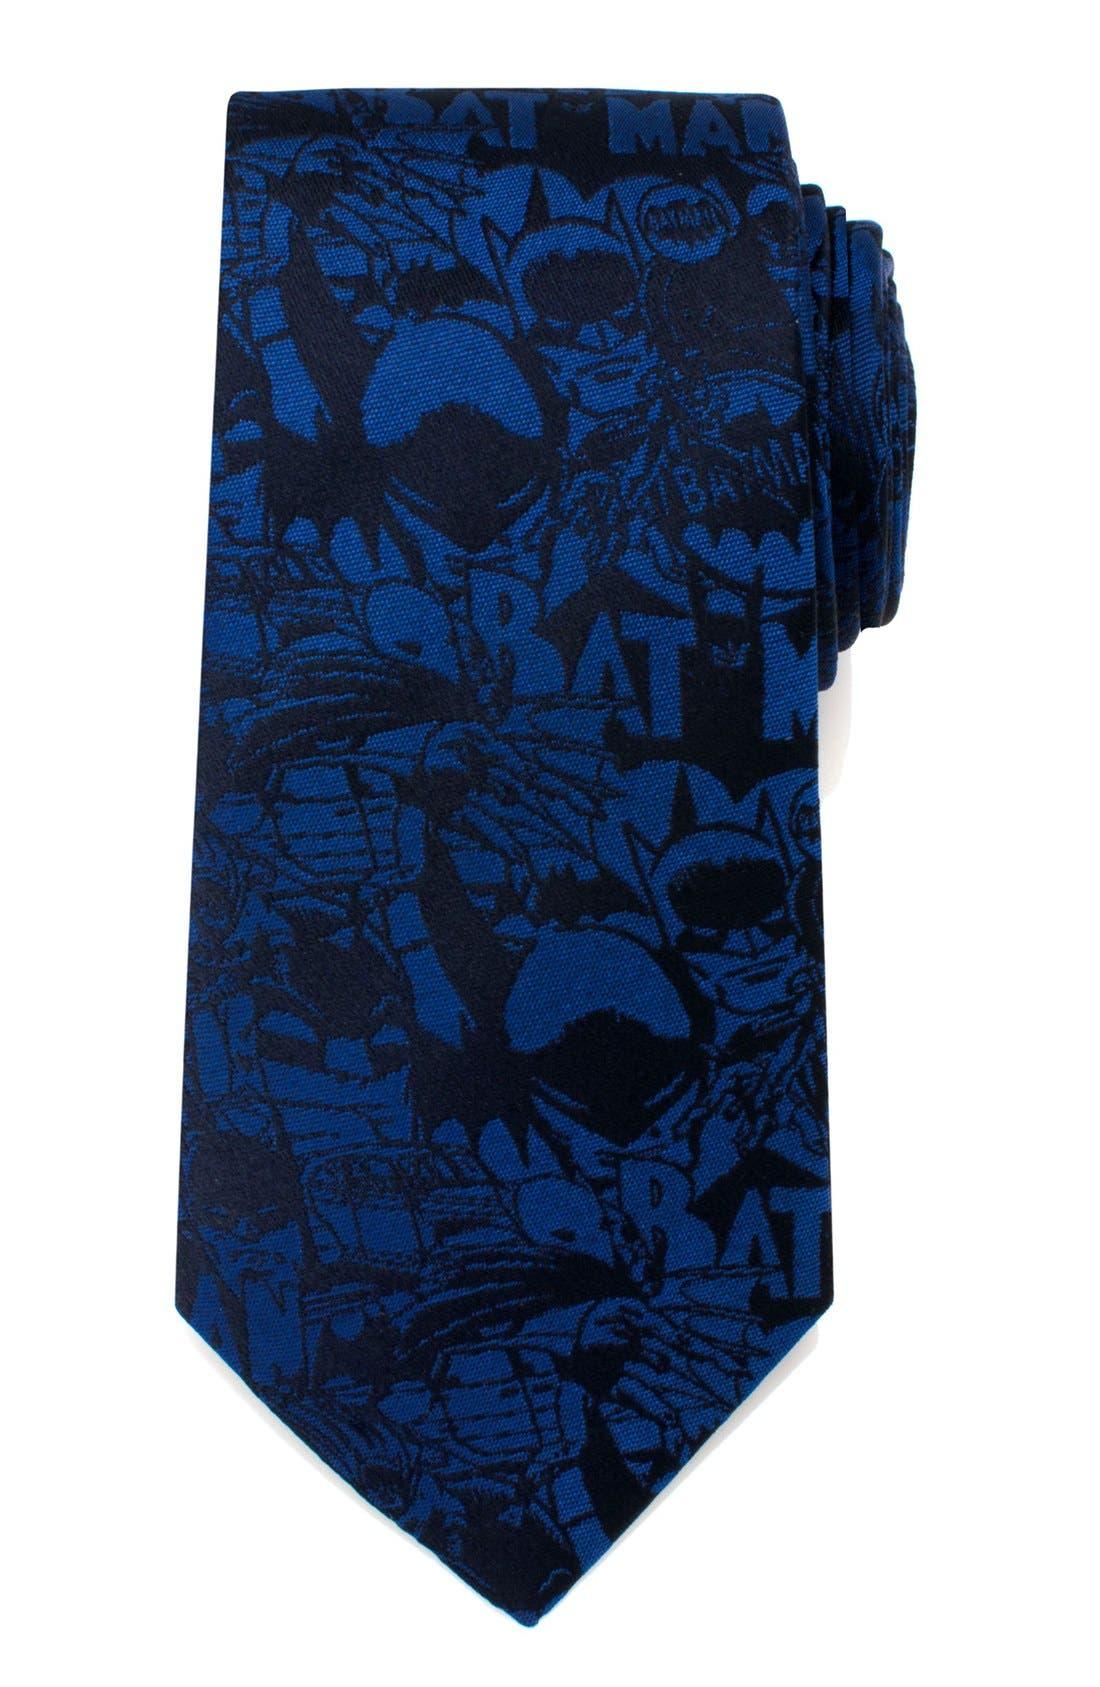 'Batman' Silk Tie,                             Main thumbnail 1, color,                             BLUE